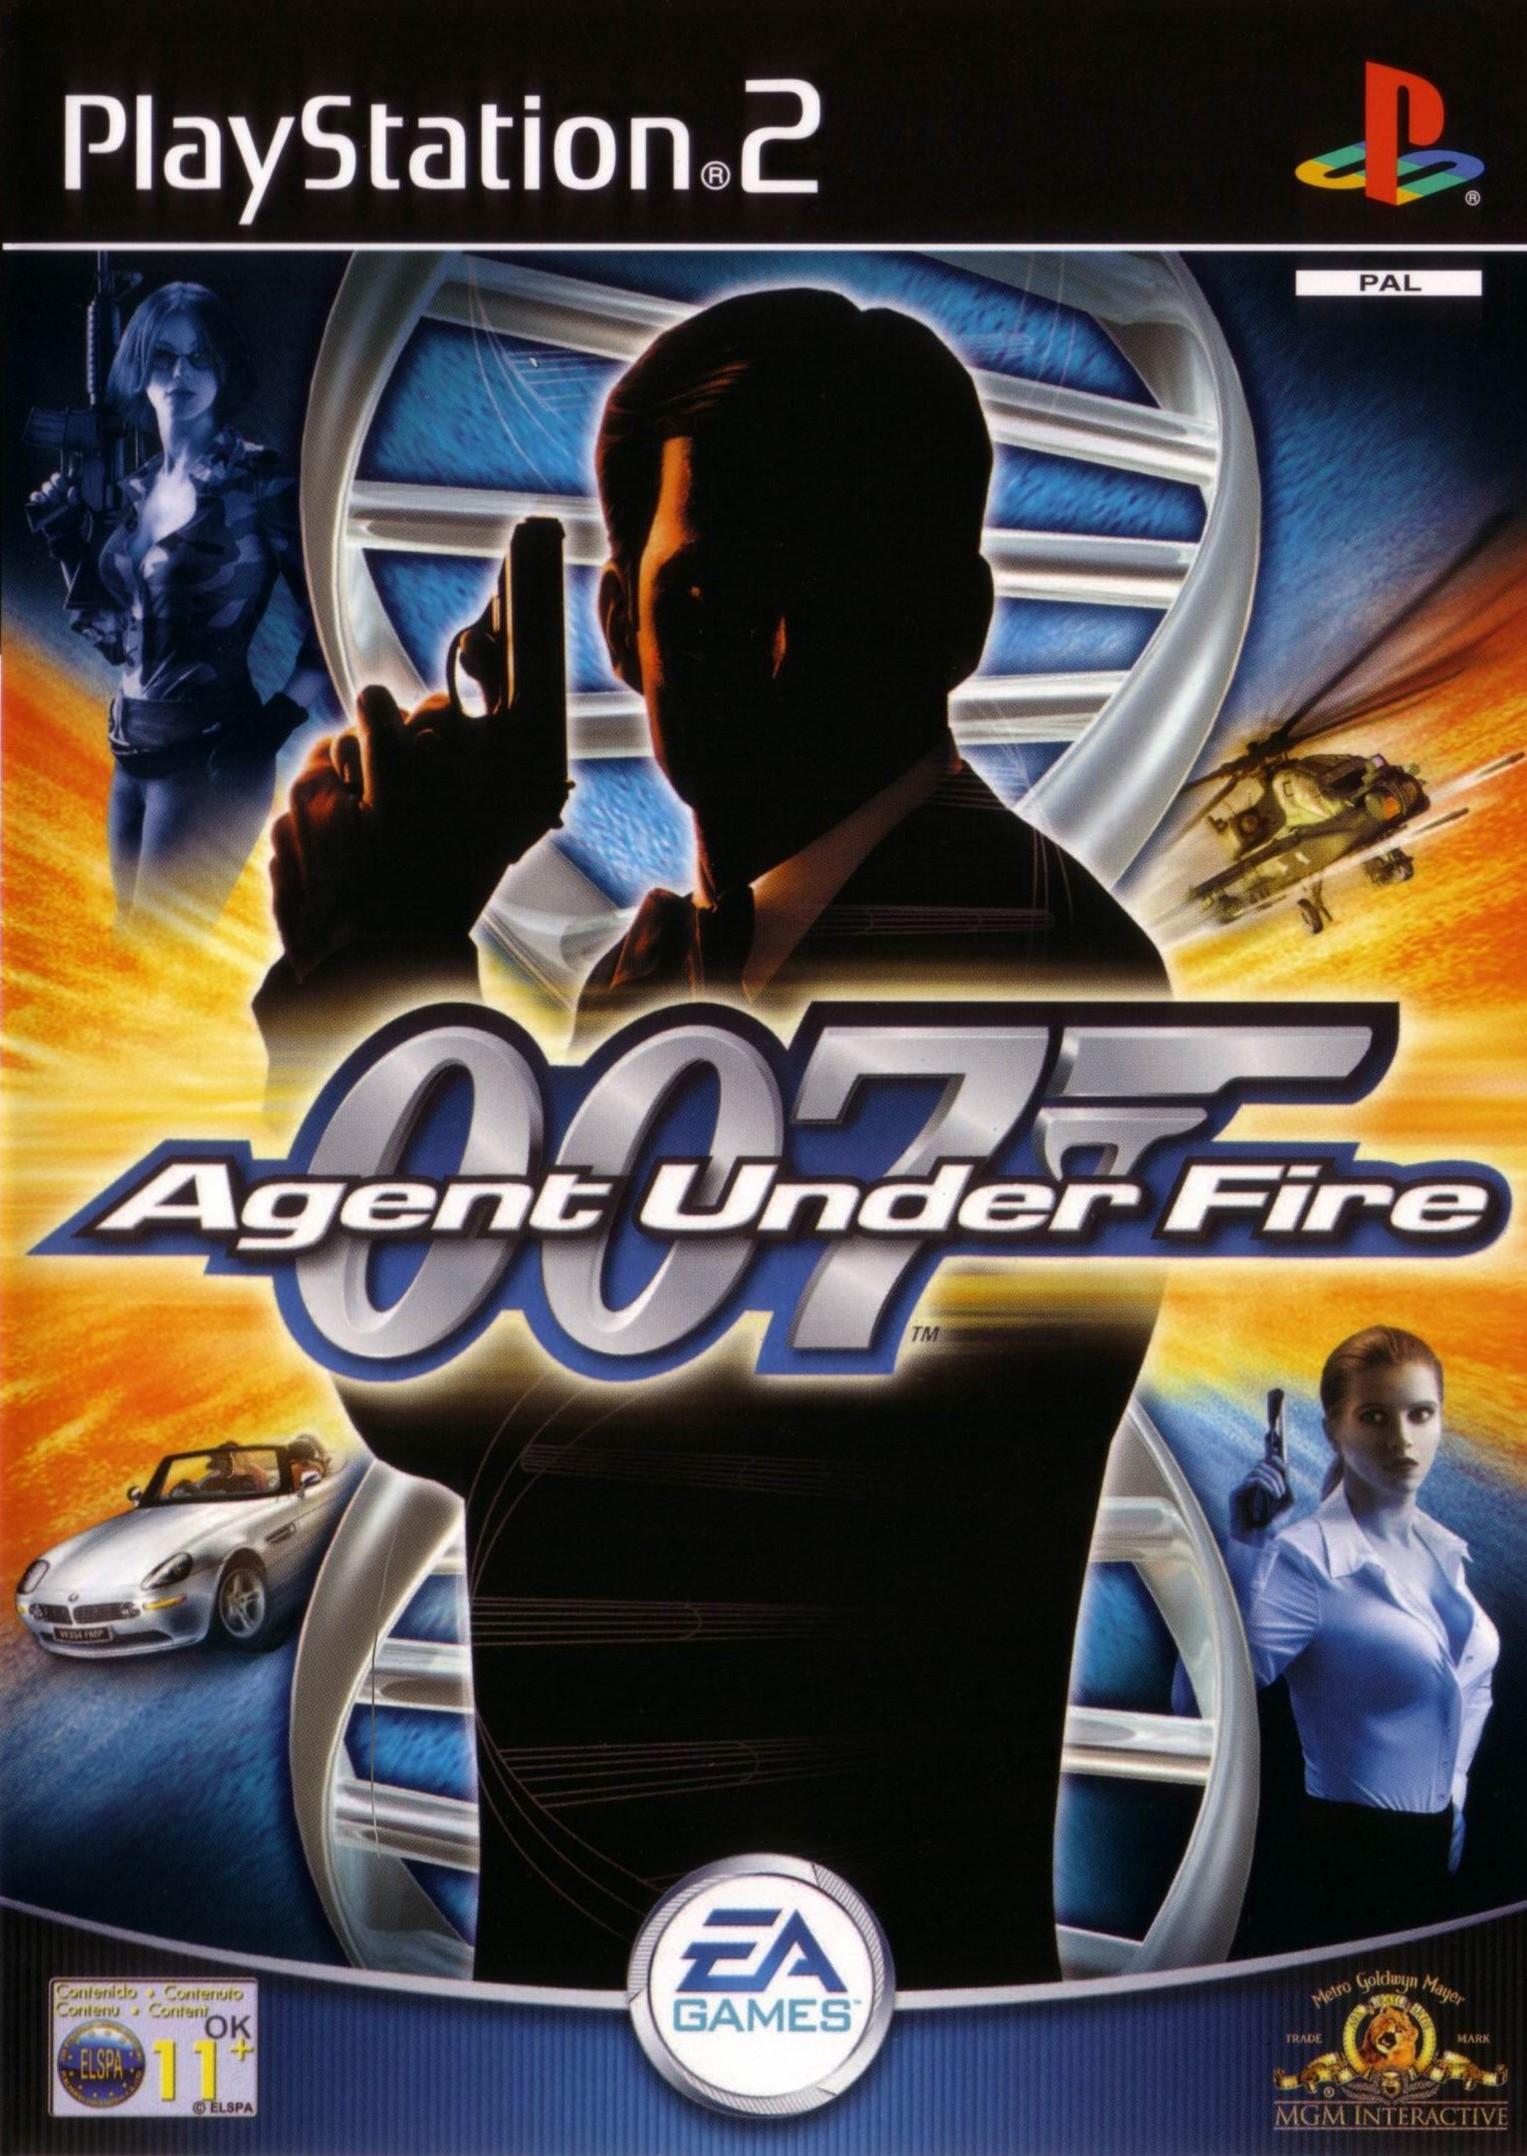 James Bond 007 Agent Under Fire StrategyWiki The Video